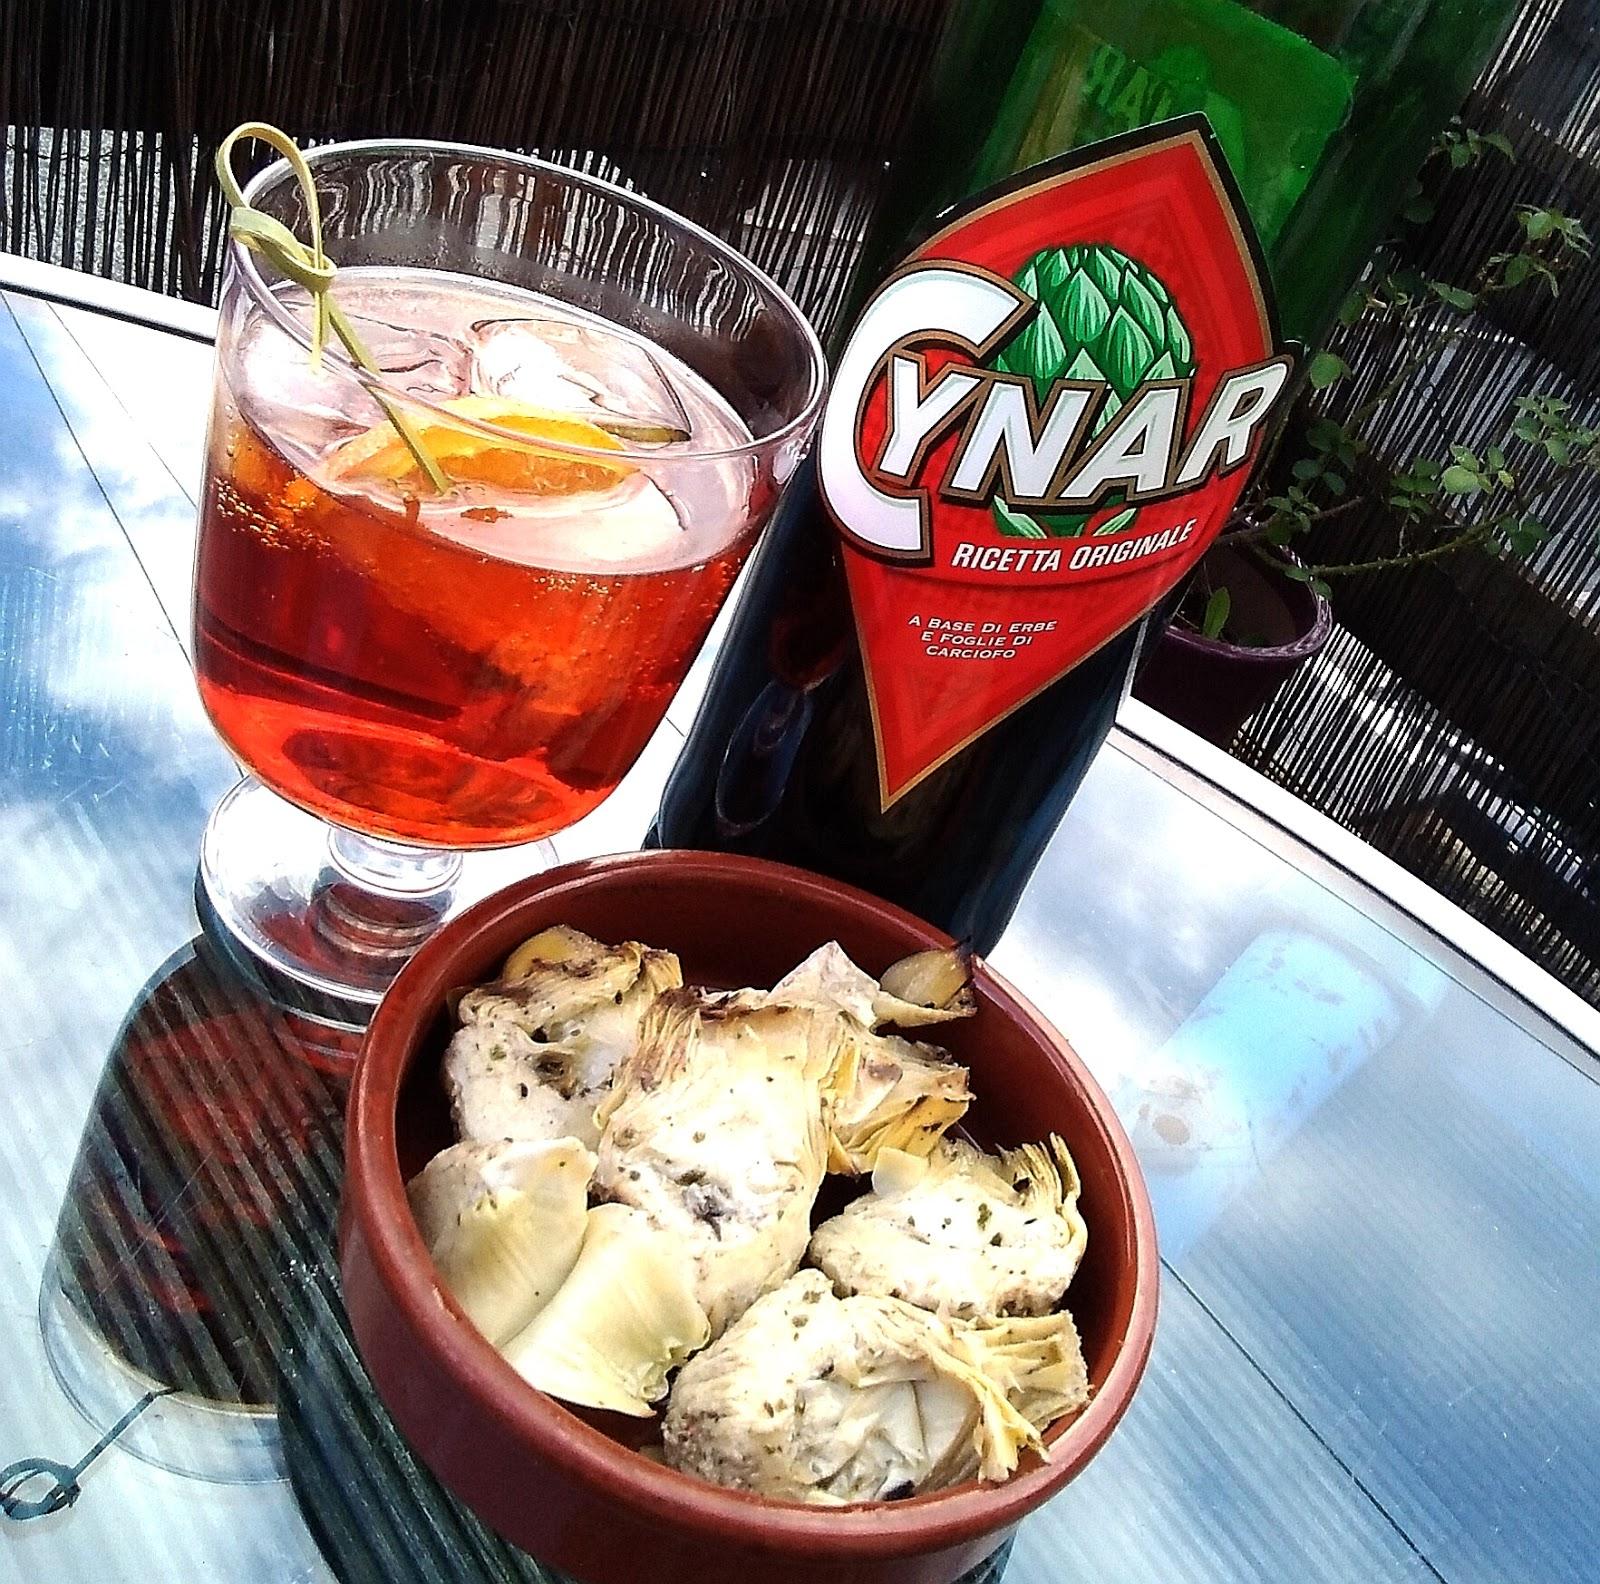 Ricetta Spritz Iba.Spritz And More